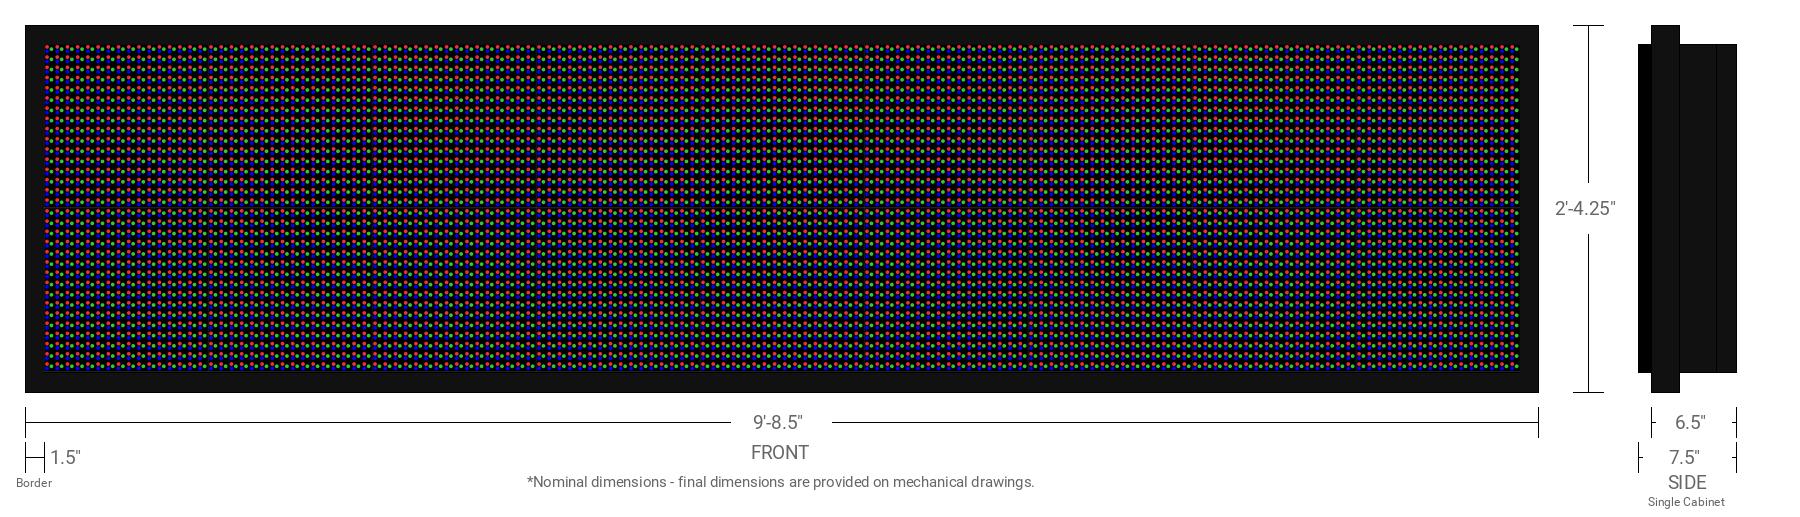 Aurora 20mm 32x144 Single Sided Full Color LED Display